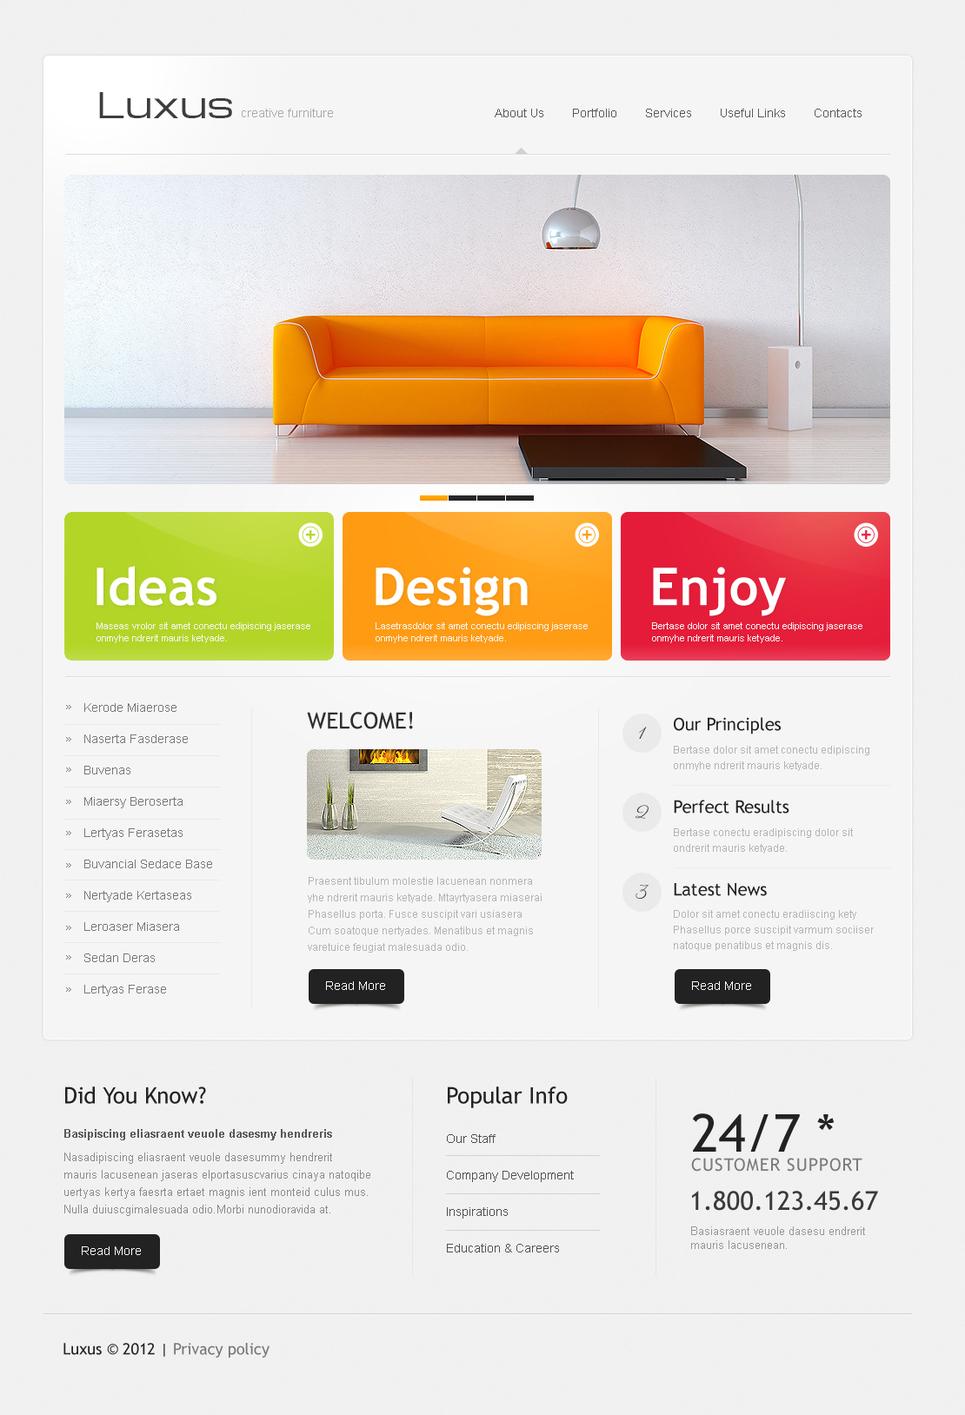 Interior Design Website Template with Colorful Bricks - image